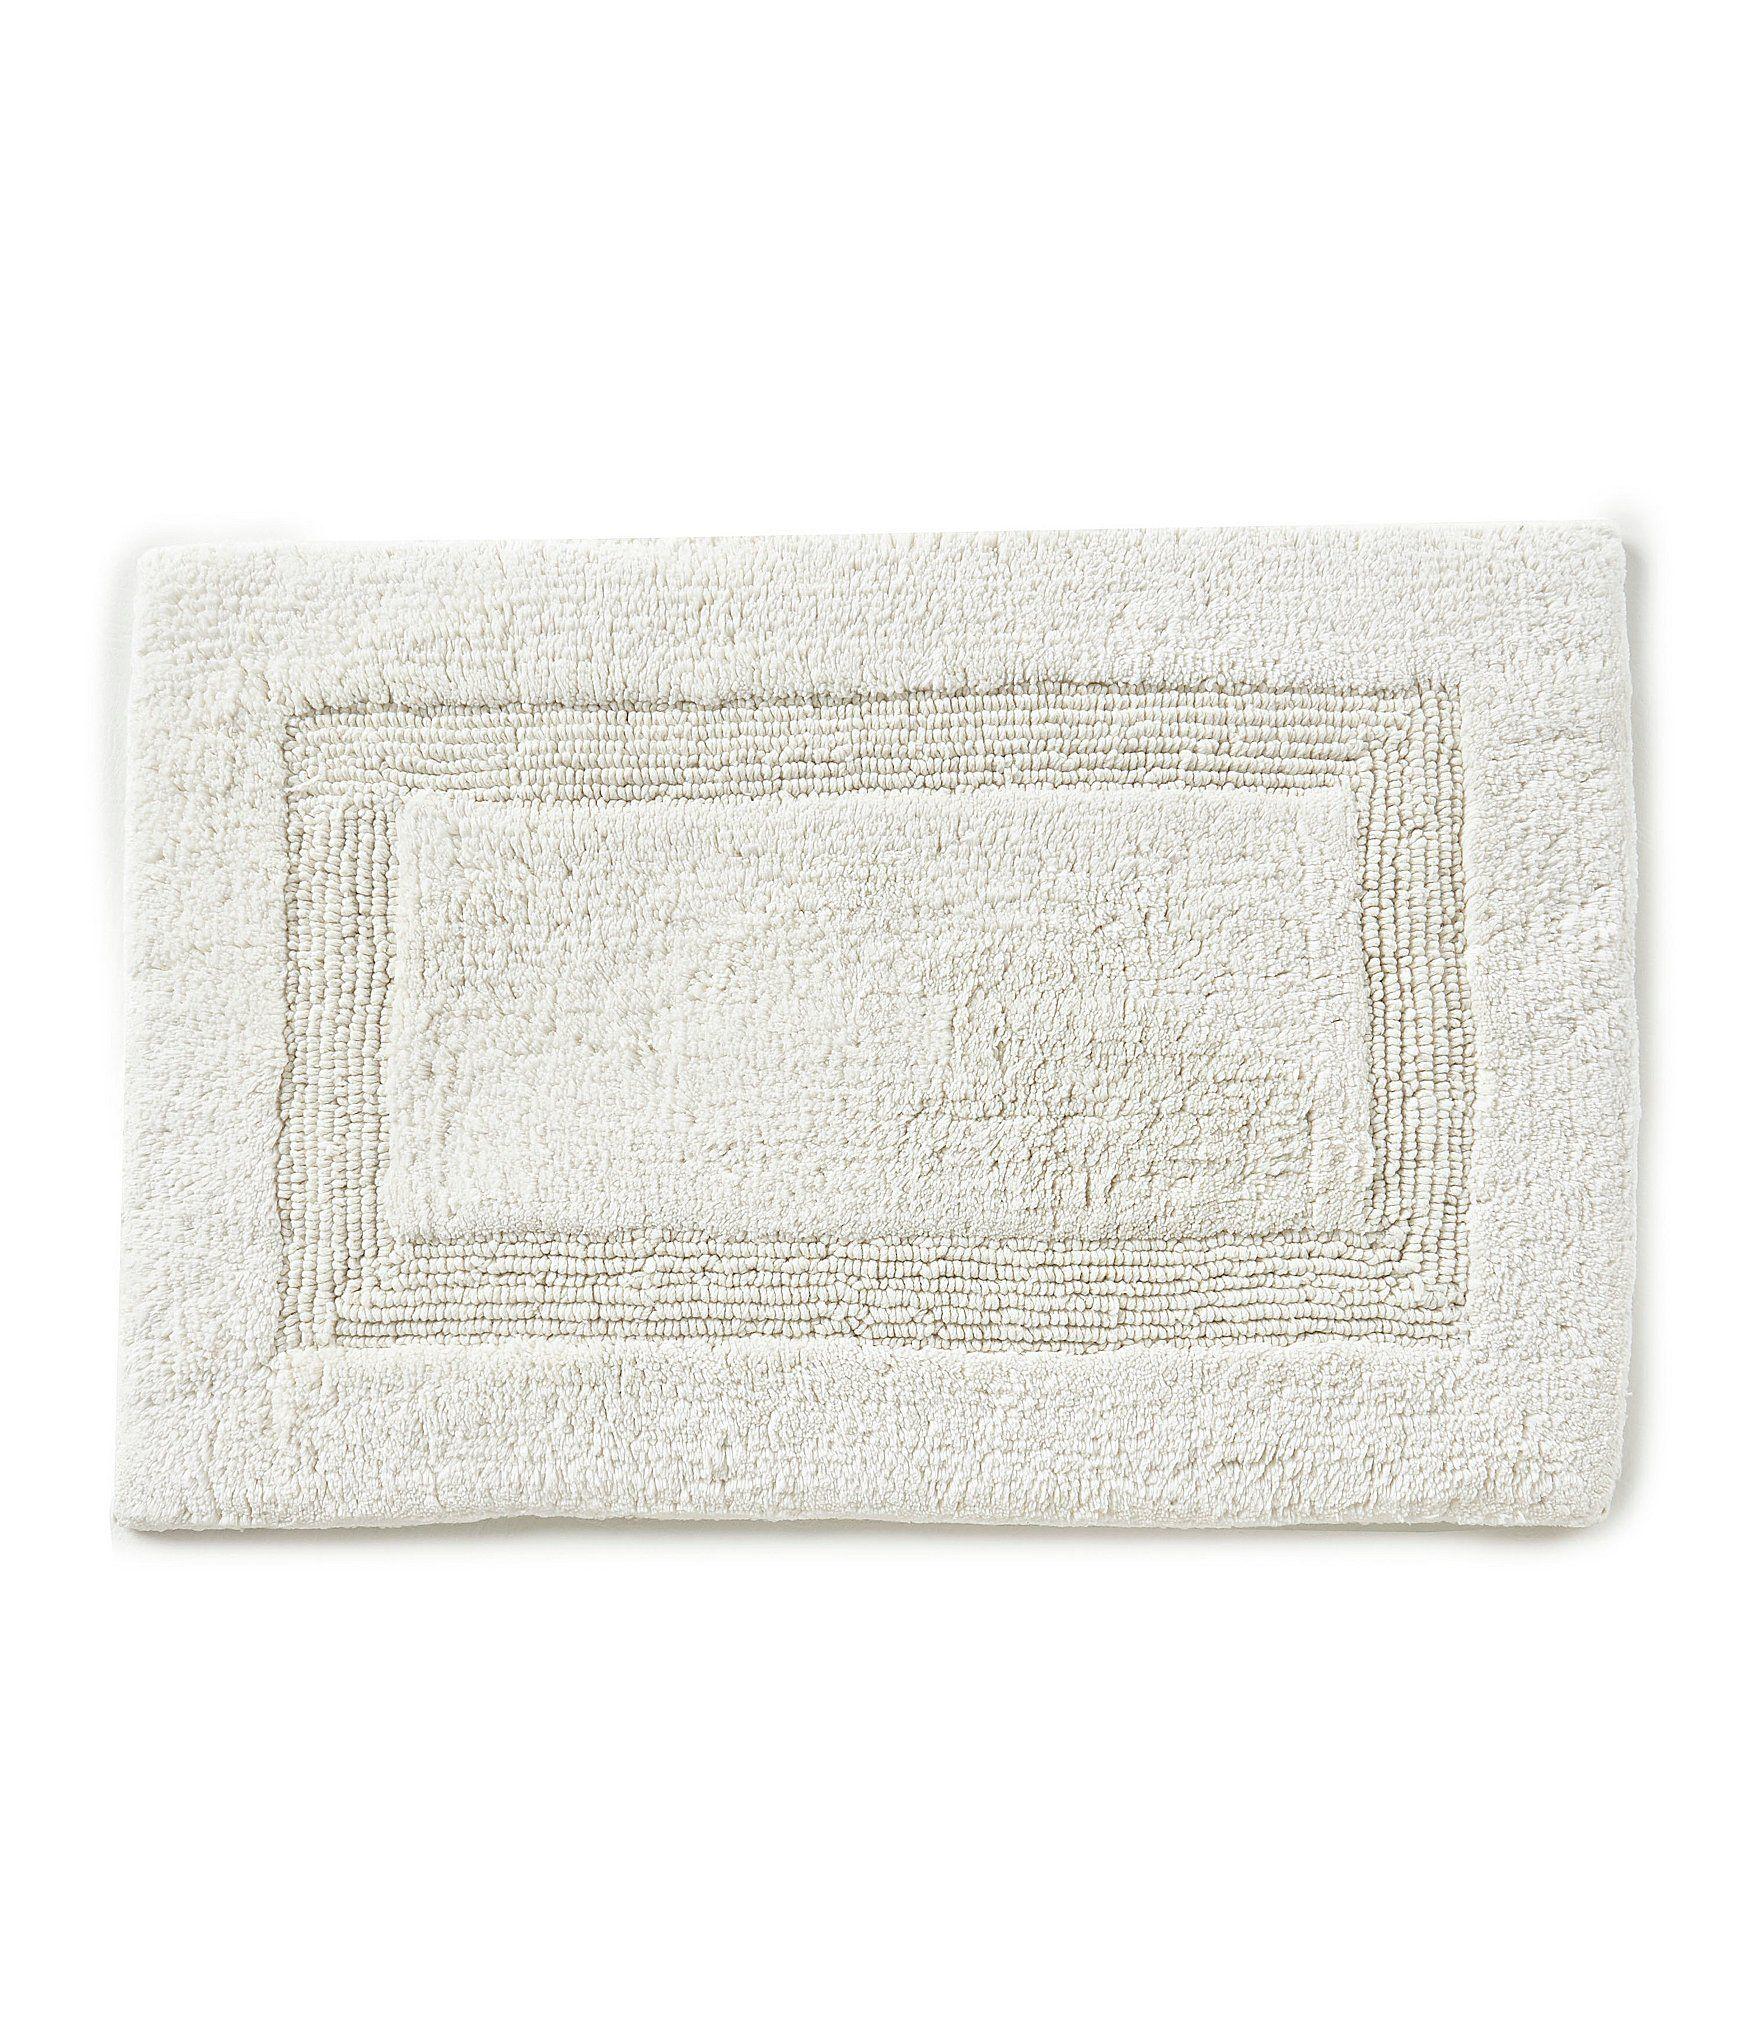 Southern Living Cotton Reversible Rug Dillard S Reversible Rug Bath Runner Rugs Medium Rugs [ 2040 x 1760 Pixel ]